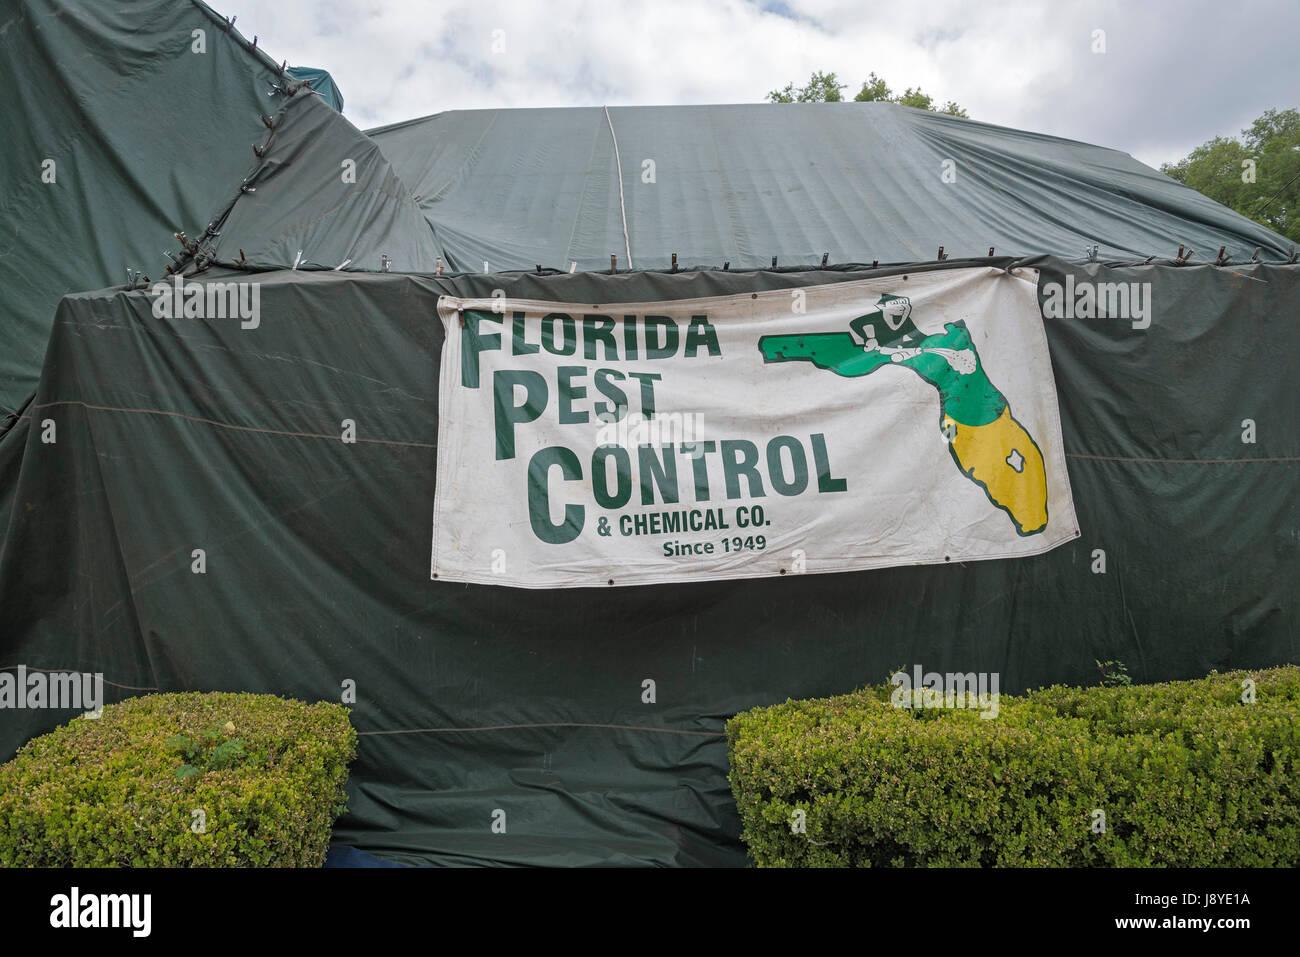 Tent fumigation of home & Tent fumigation of home Stock Photo: 143203910 - Alamy